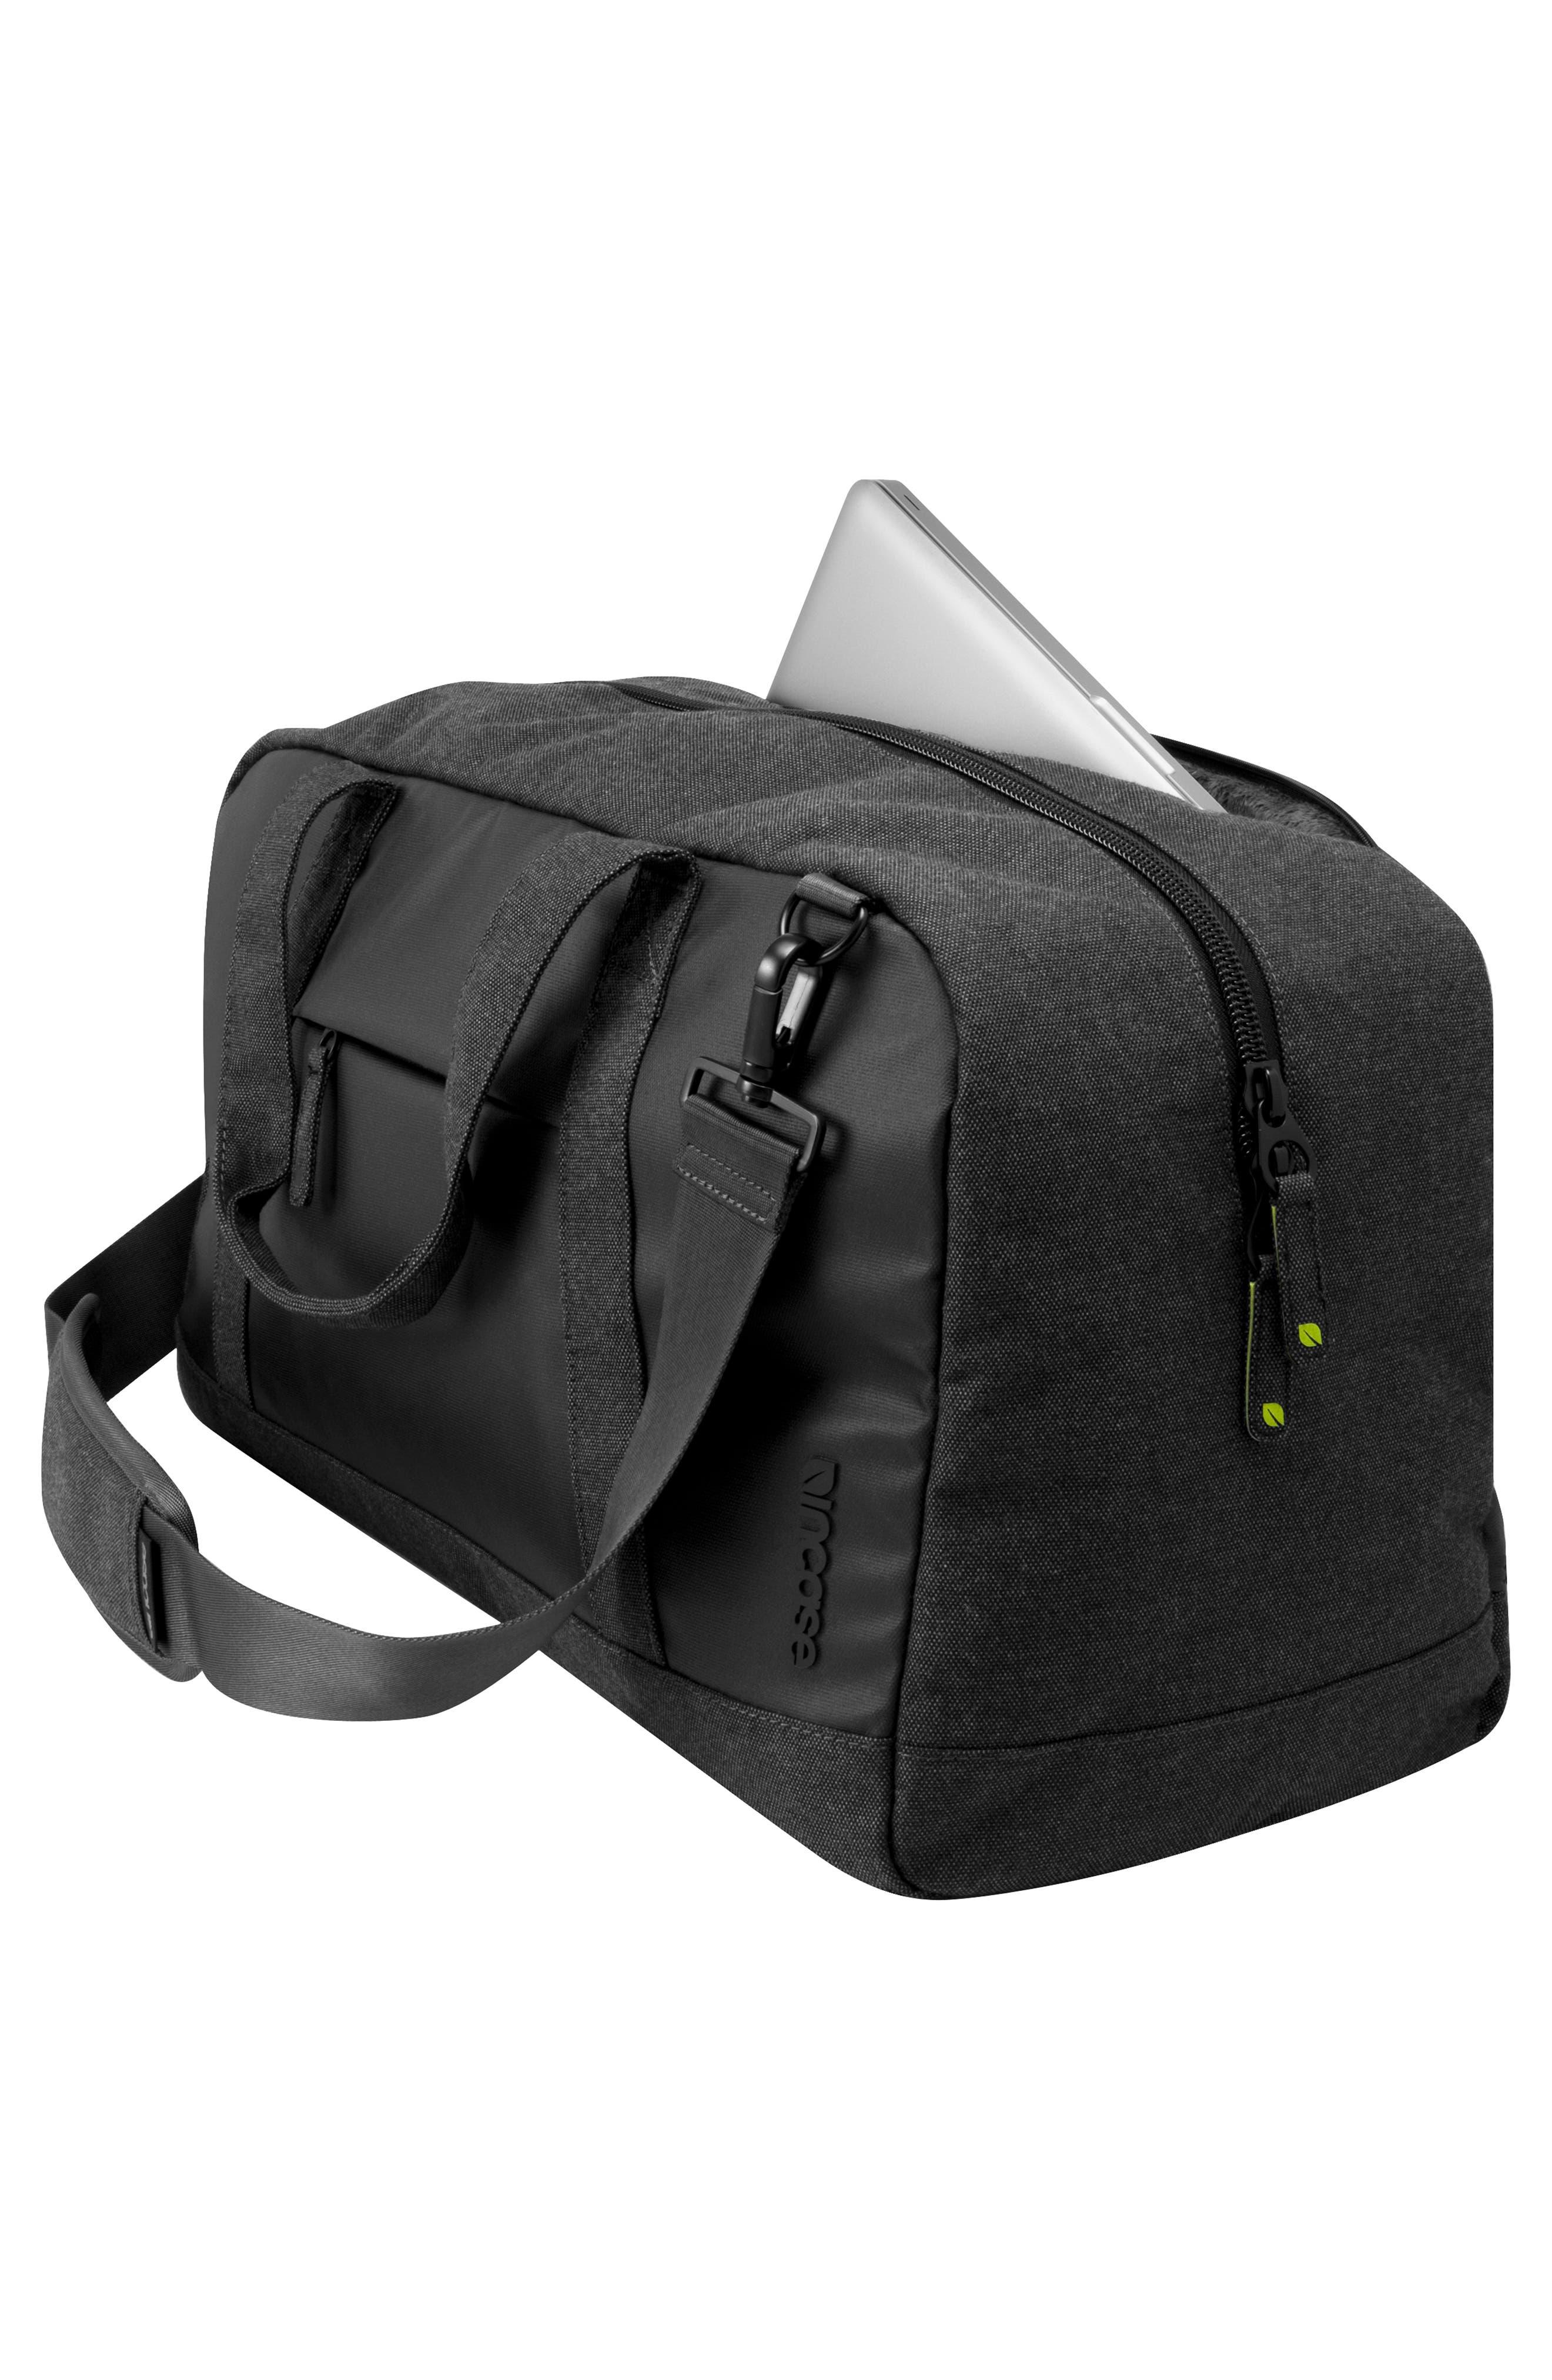 INCASE DESIGNS,                             EO Duffel Bag,                             Alternate thumbnail 6, color,                             BLACK